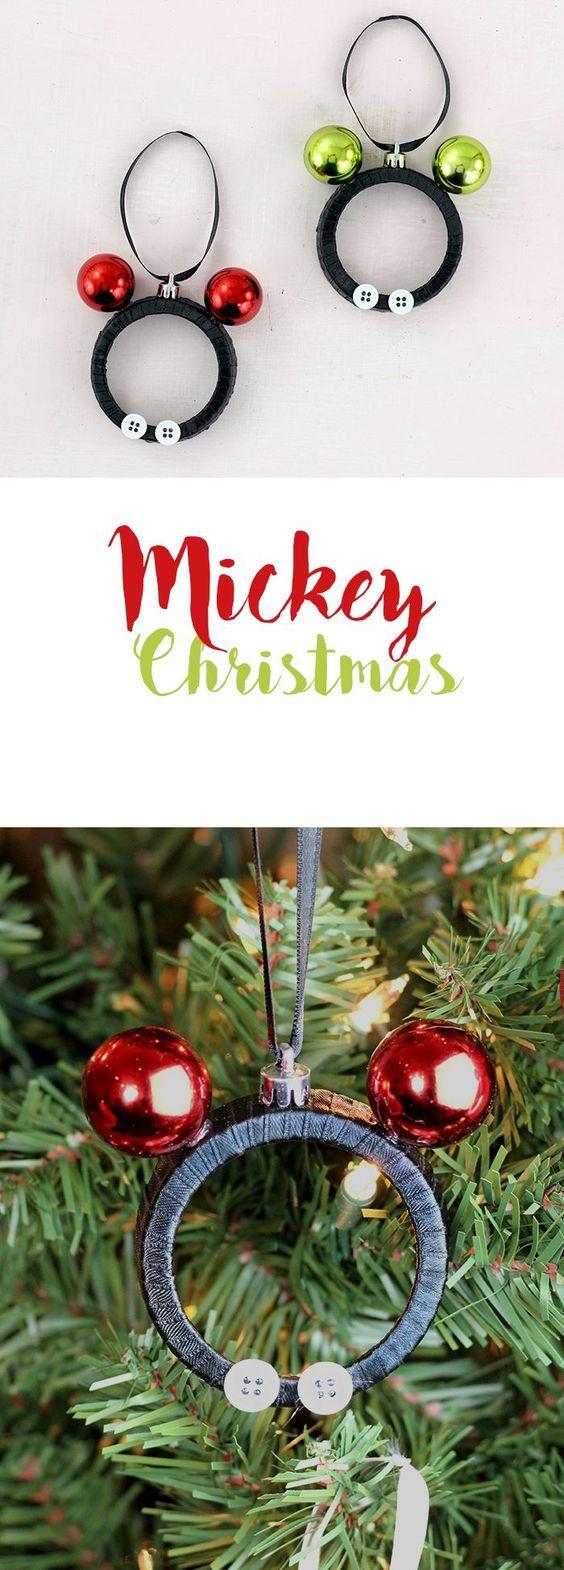 Mickey and Minnie DIY Mason Jar Lid Ornaments.